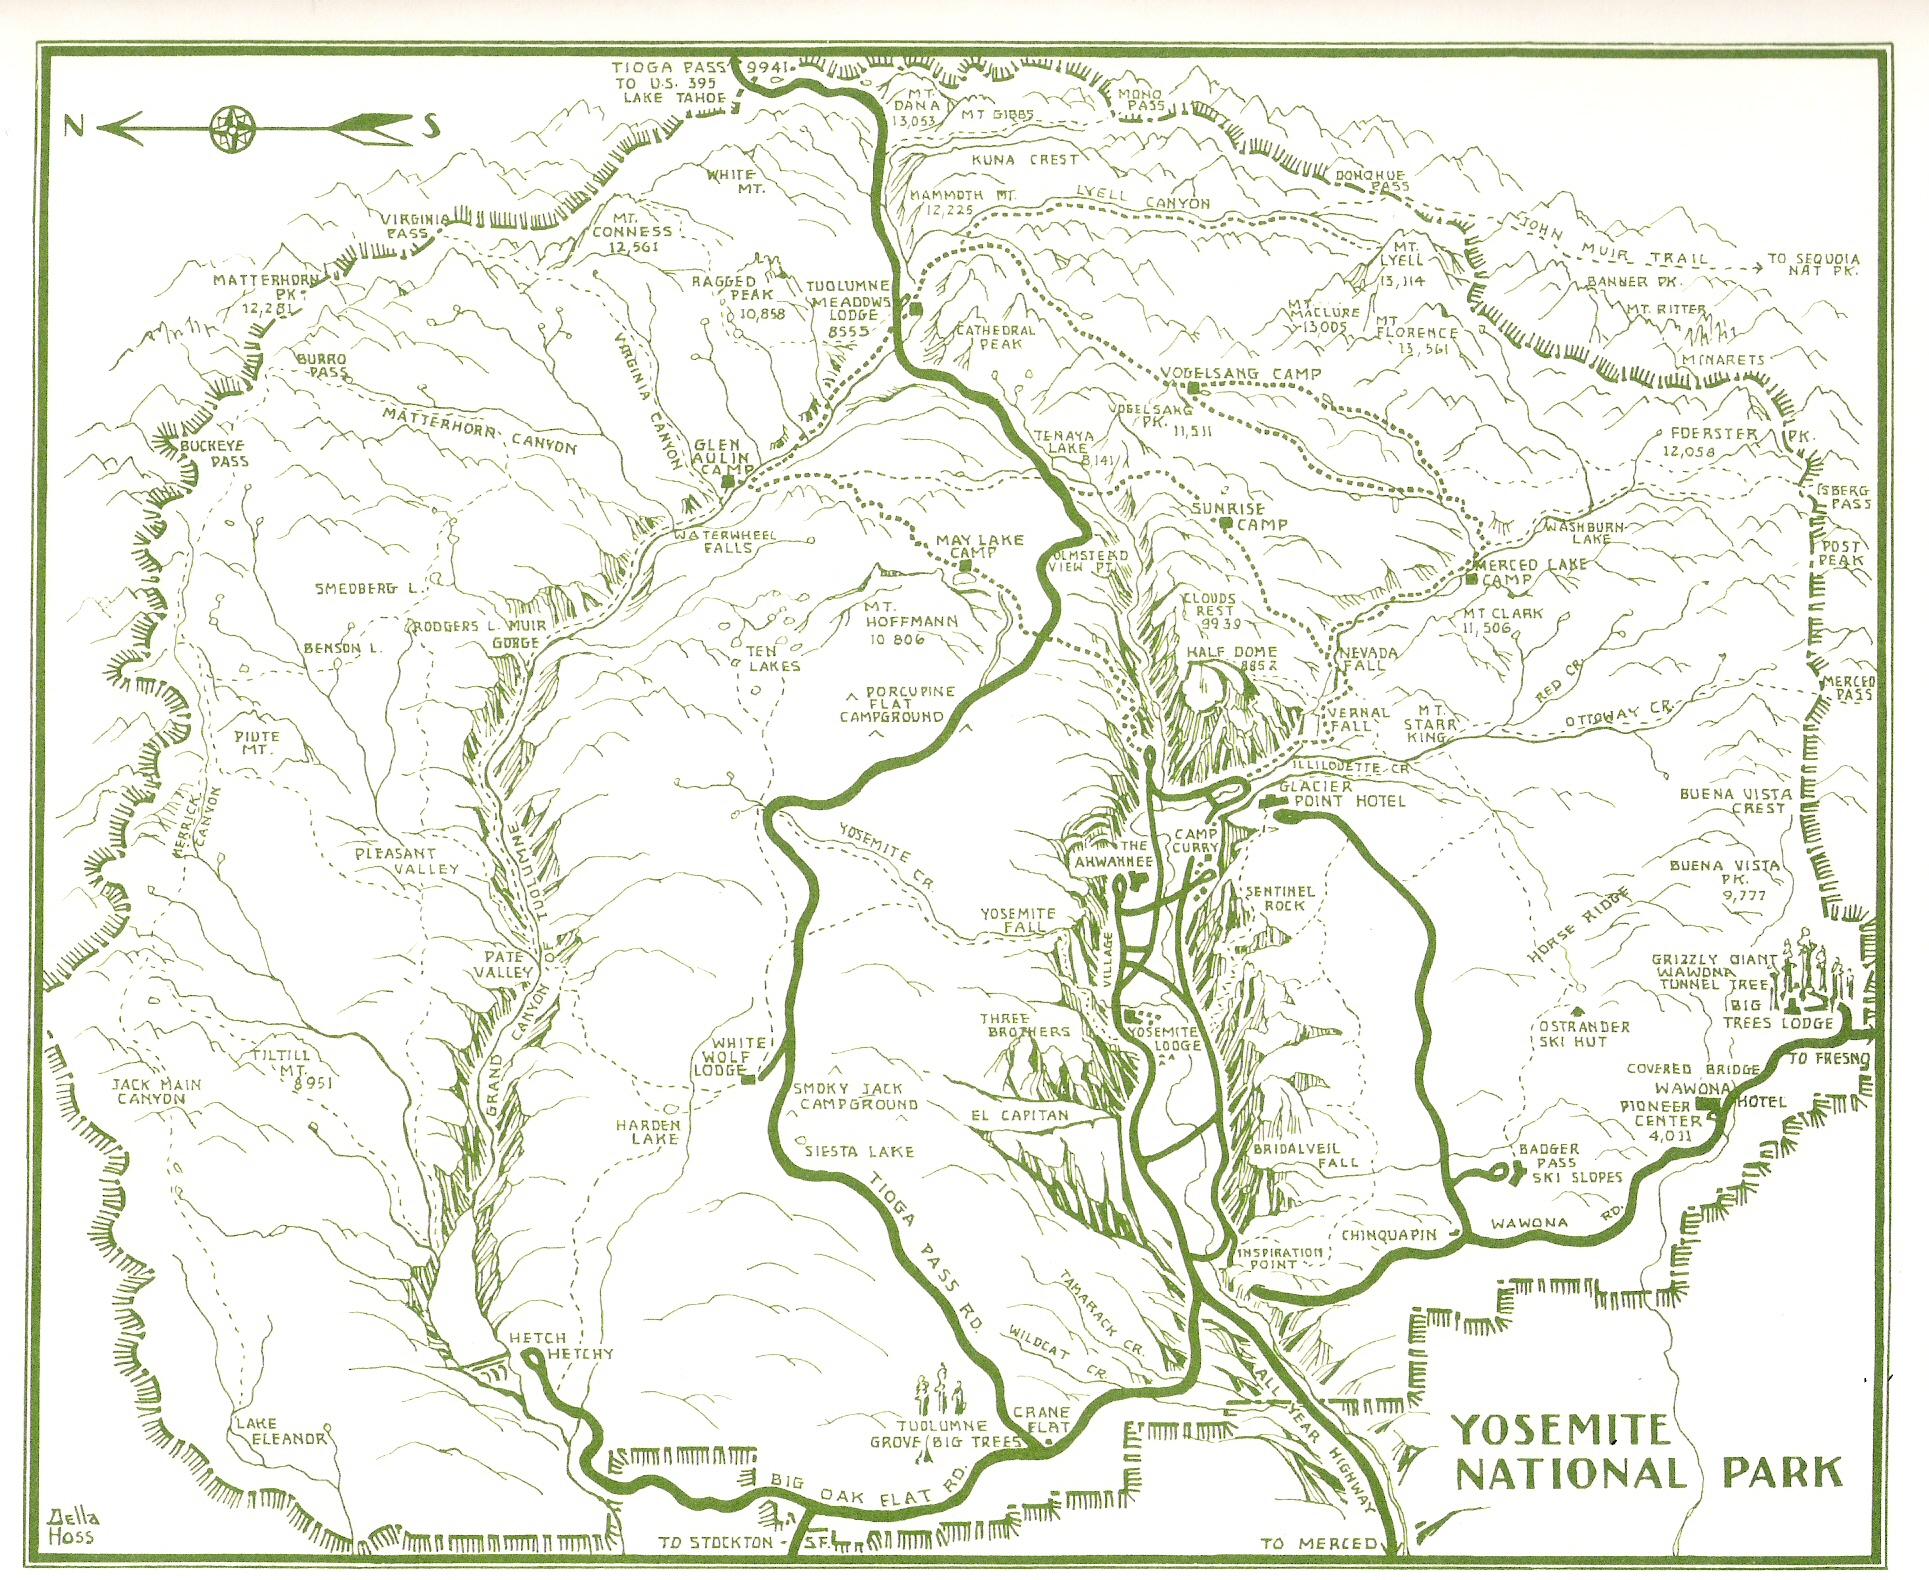 Yosemite Historic Maps (Yosemite Library Online)